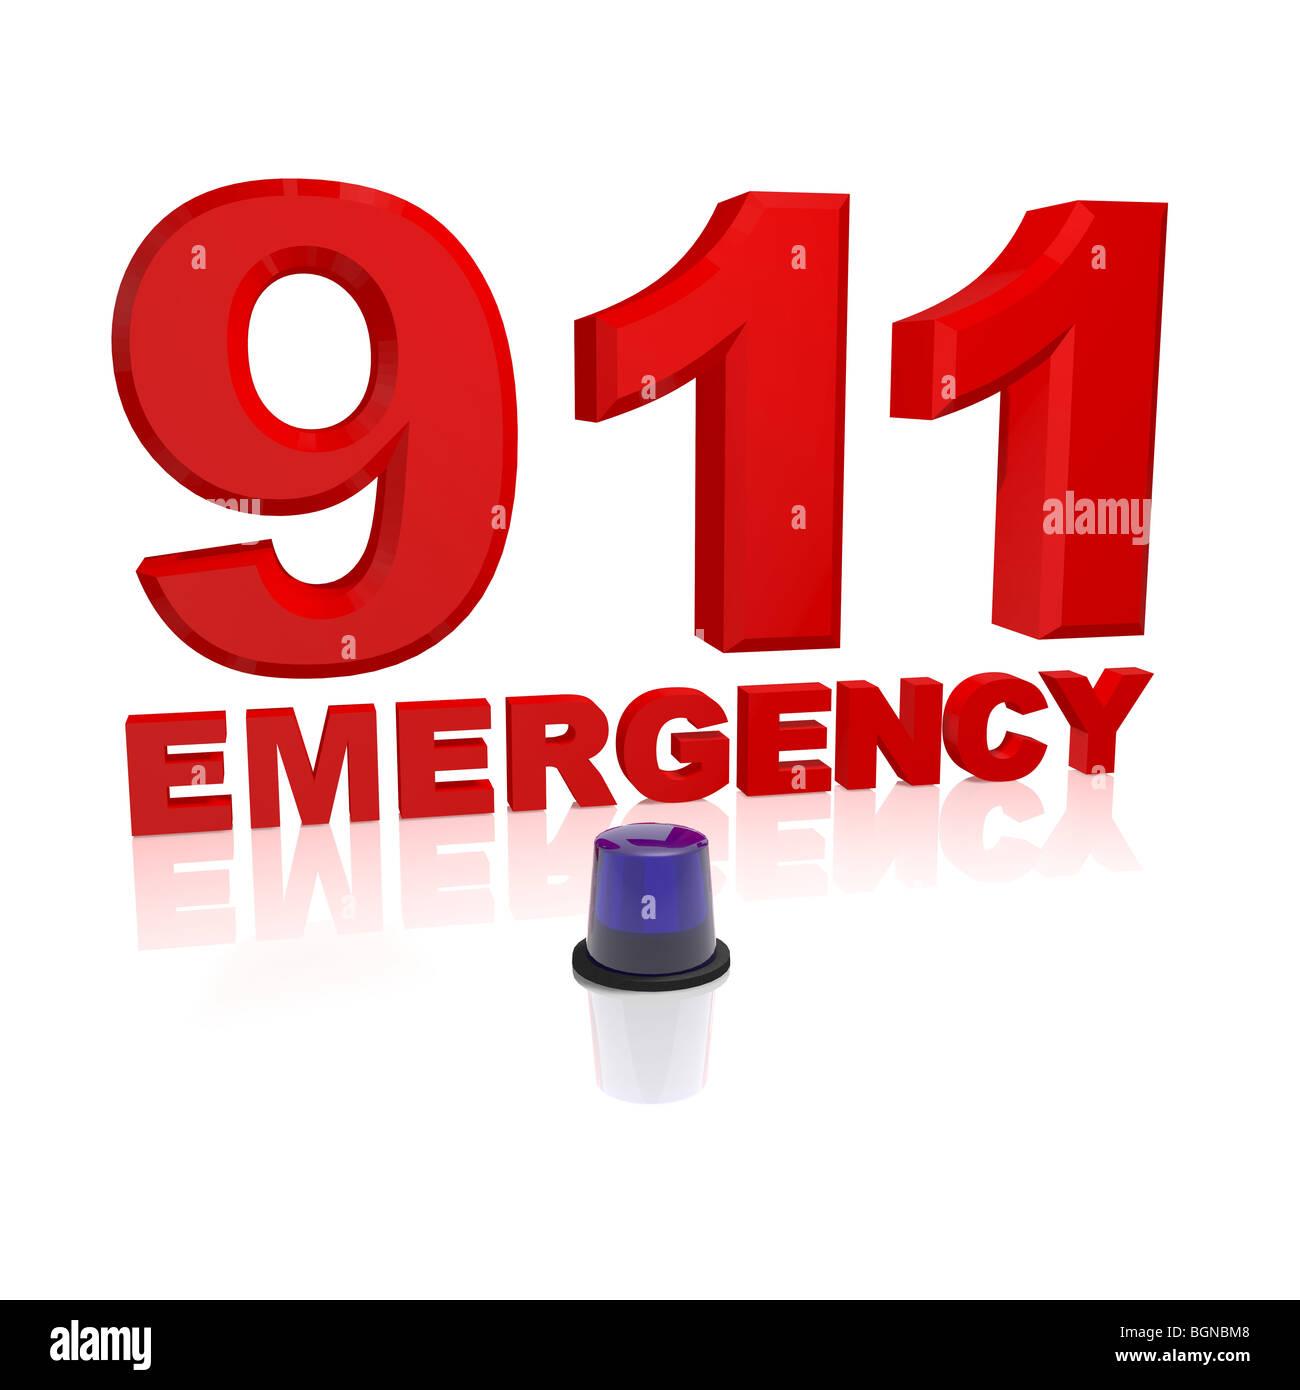 911 emergency - Stock Image